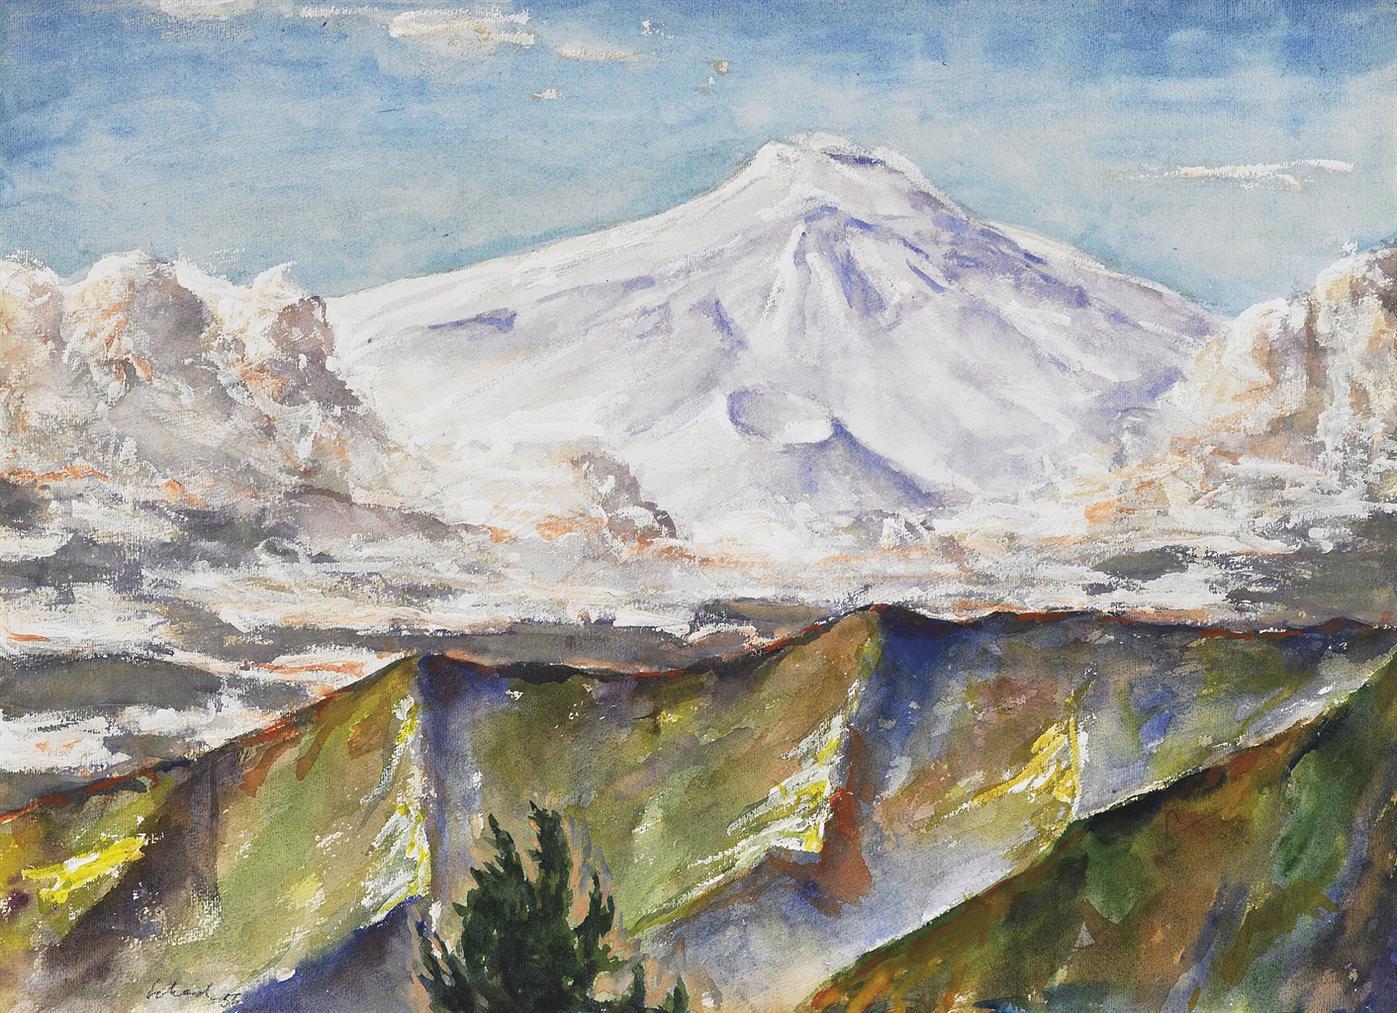 Christian Schad-Aufziehender Sturm Am Atna (Upcoming Storm At Mount Etna)-1956